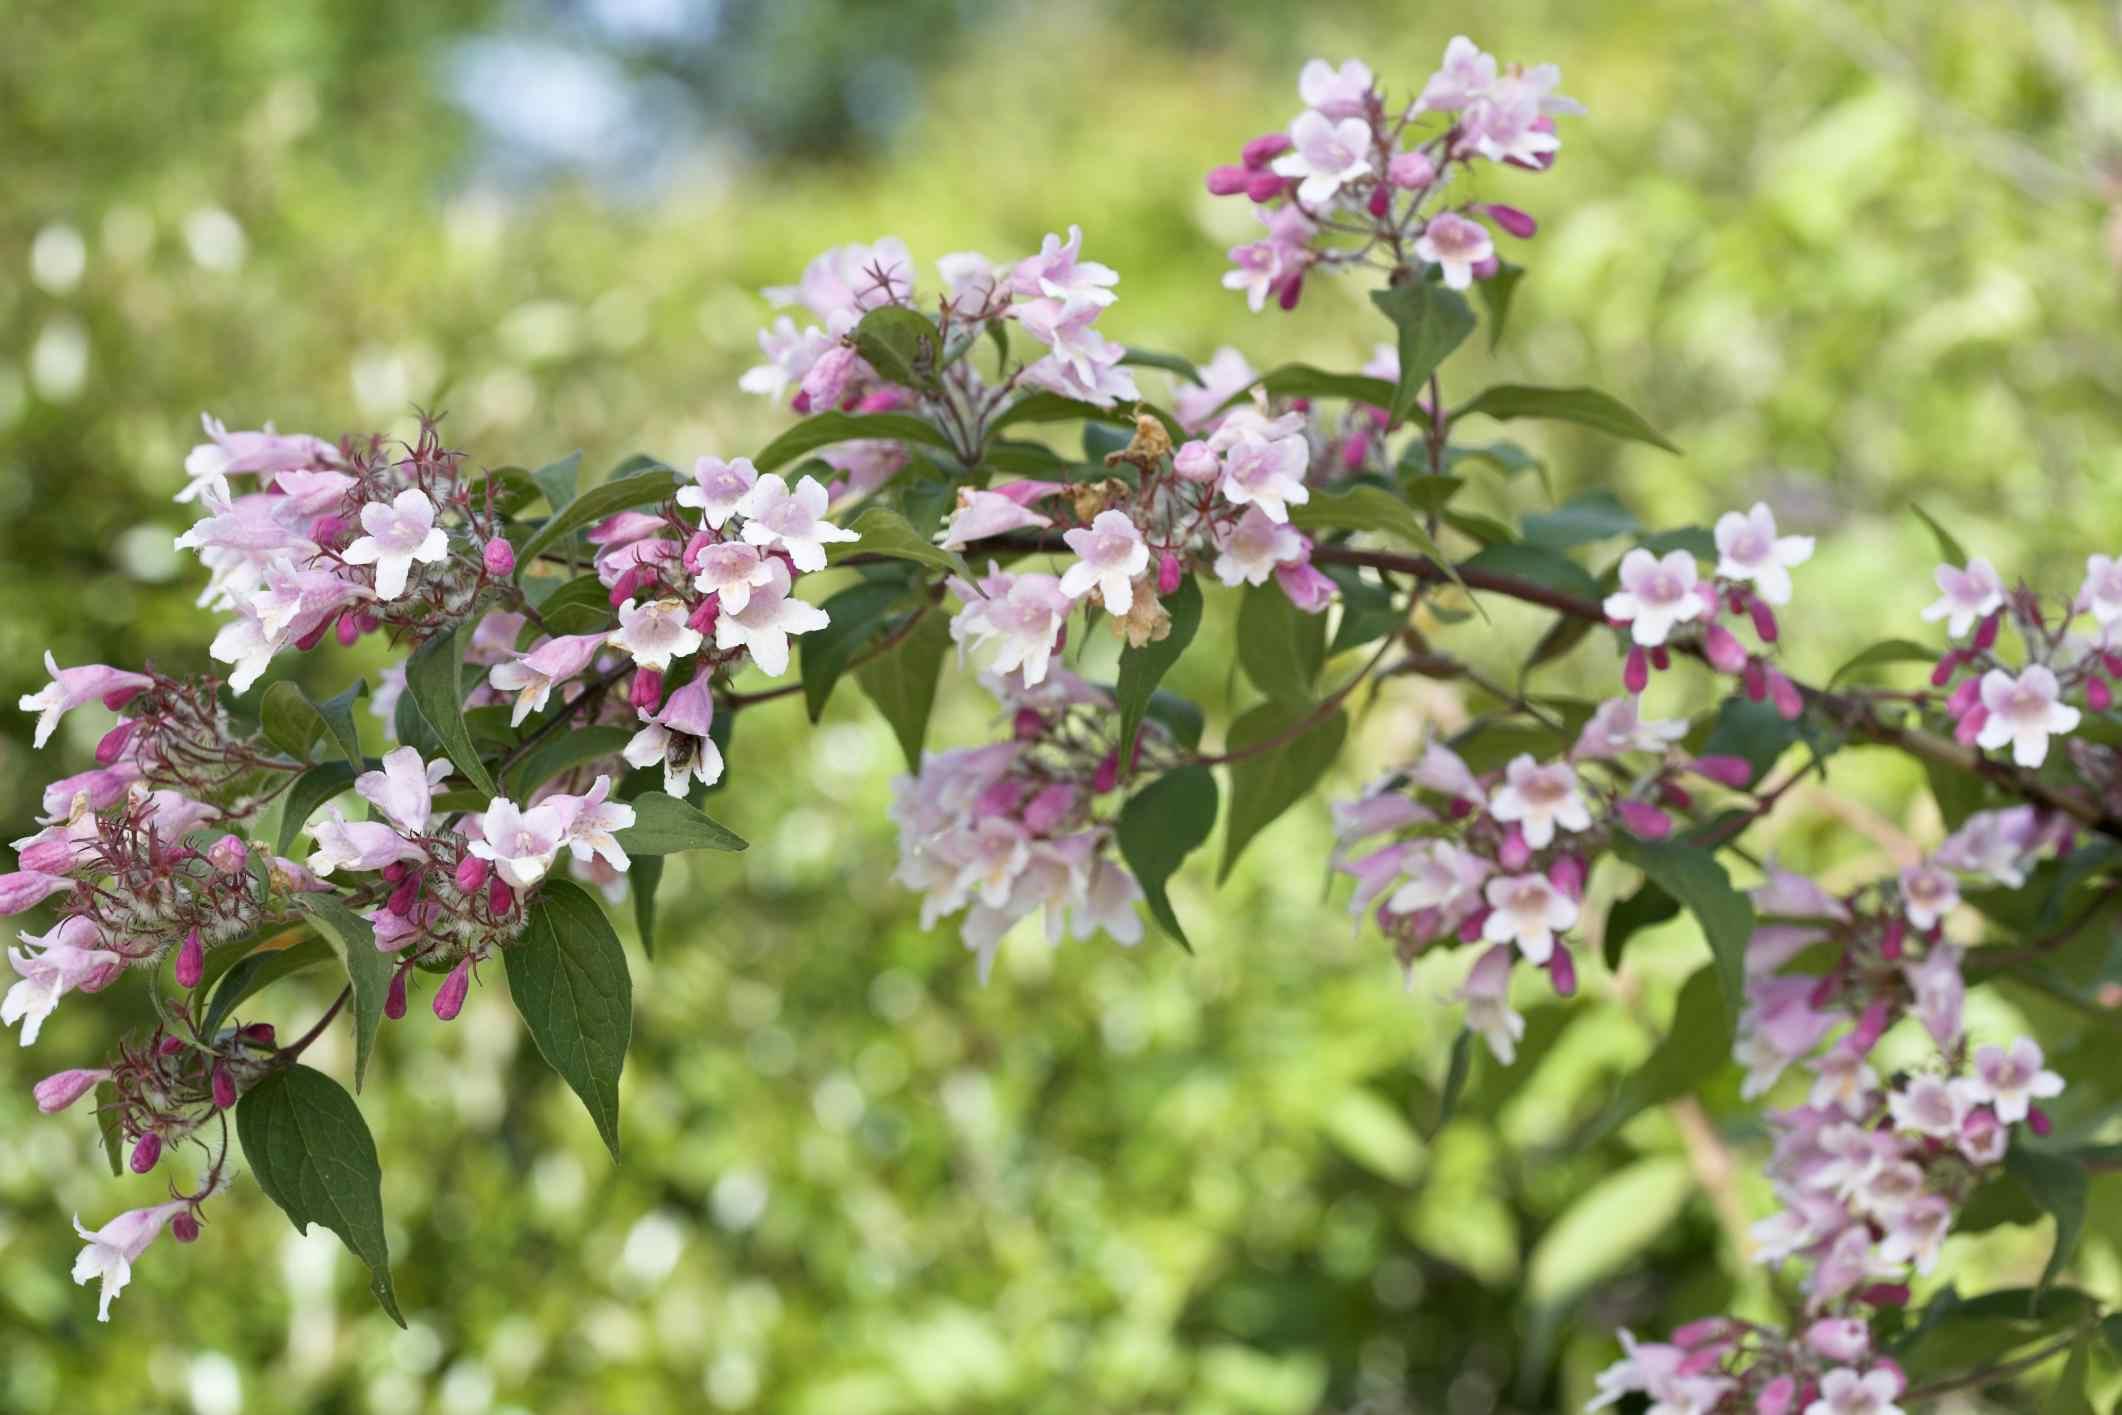 Beautybush (Kolkwitzia amabilis) 'Pink Cloud', June